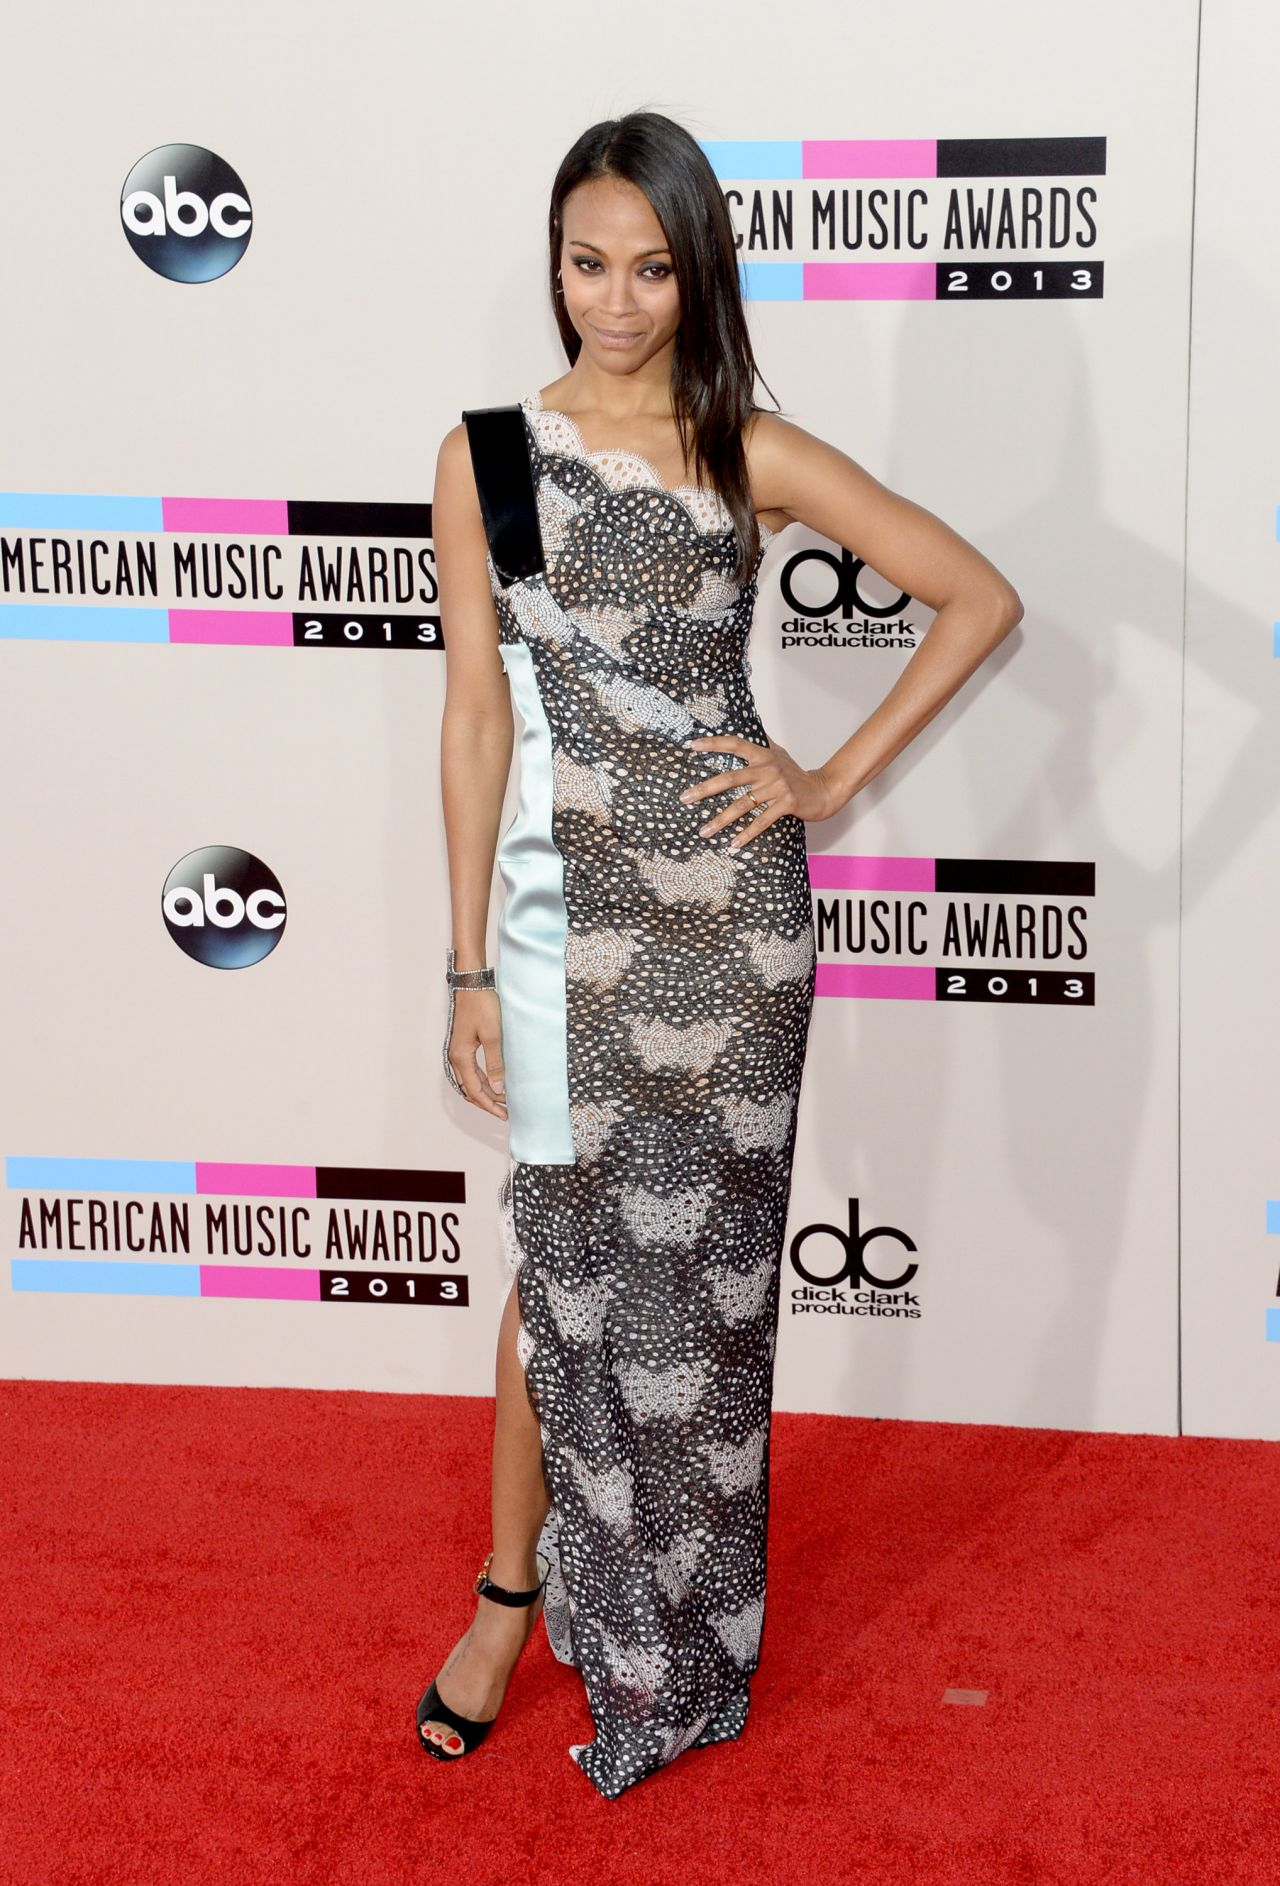 Zoe Saldana S Red Carpet Style 2013 American Music